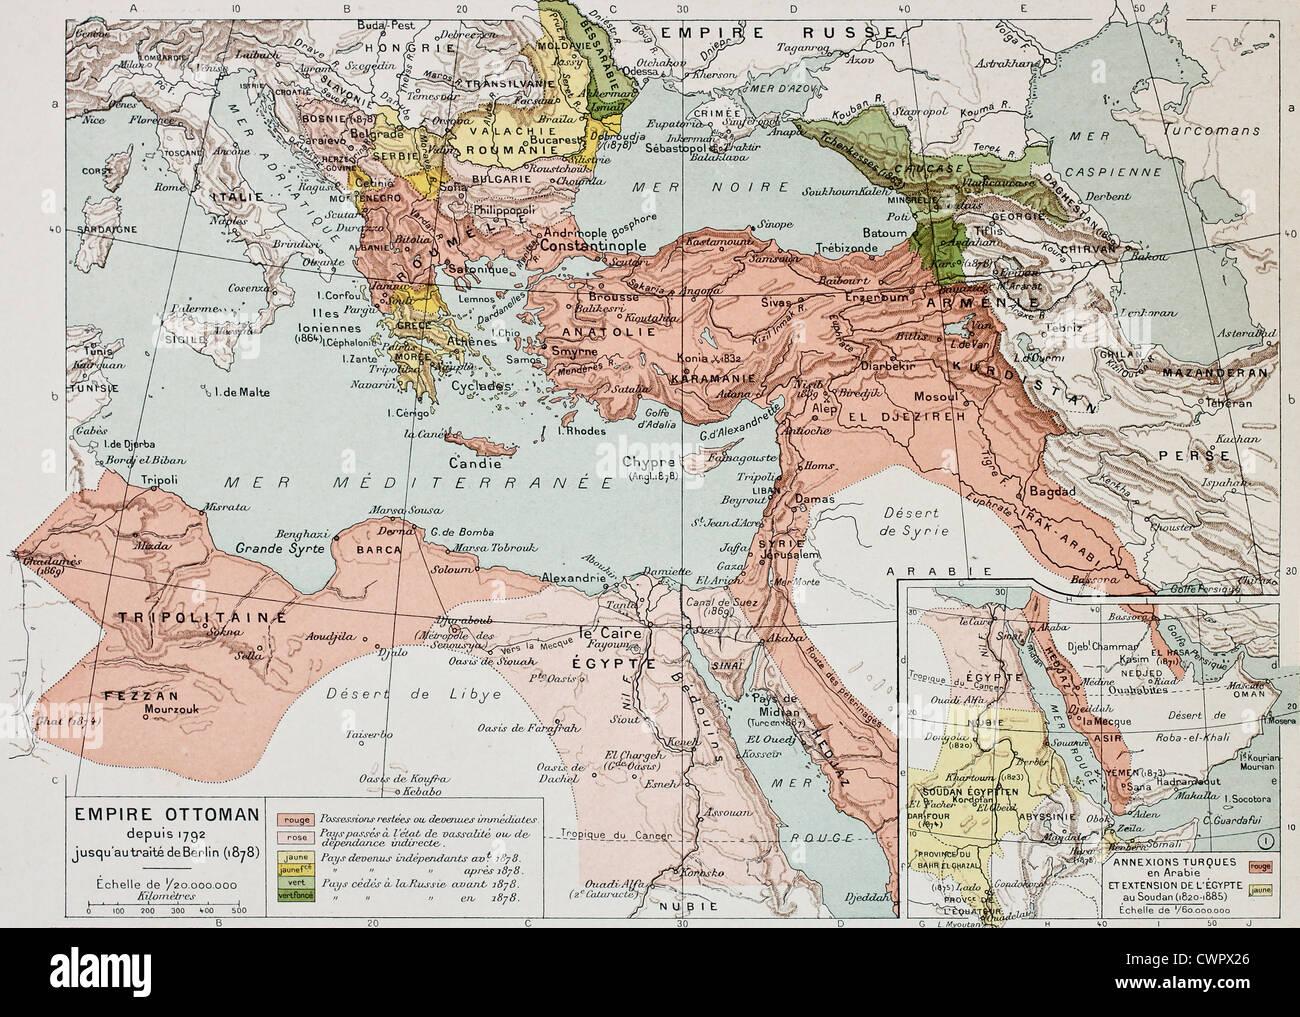 Ottoman Empire historical development old map - Stock Image